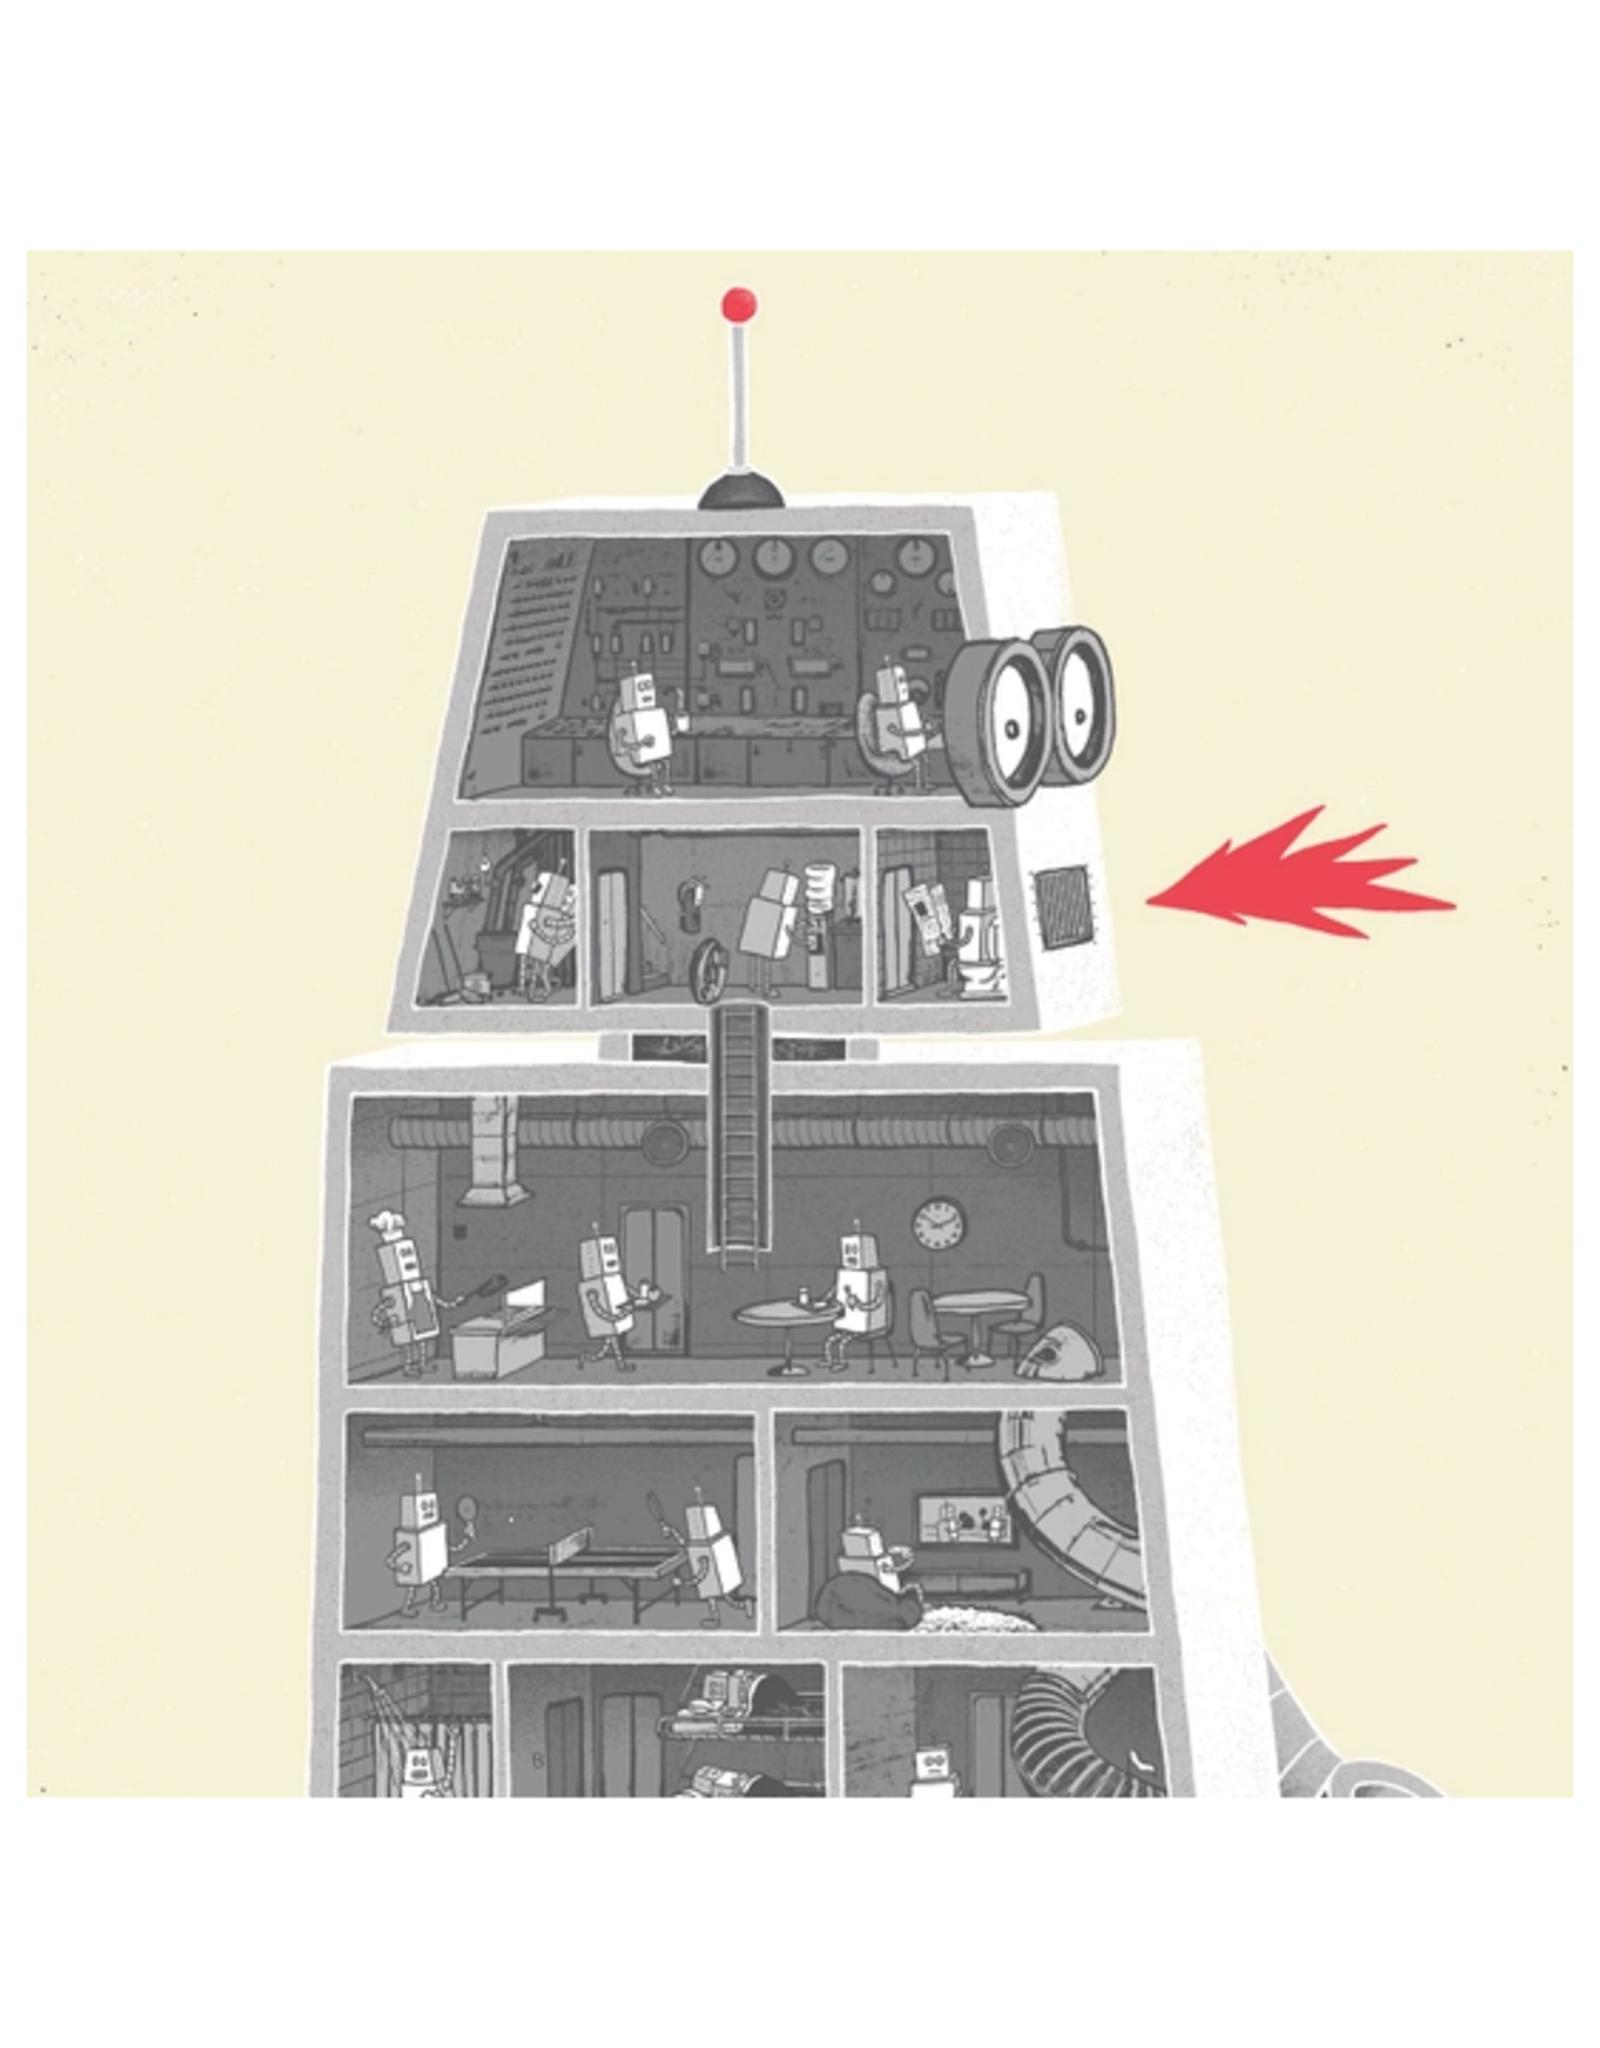 Inside the Robot Print